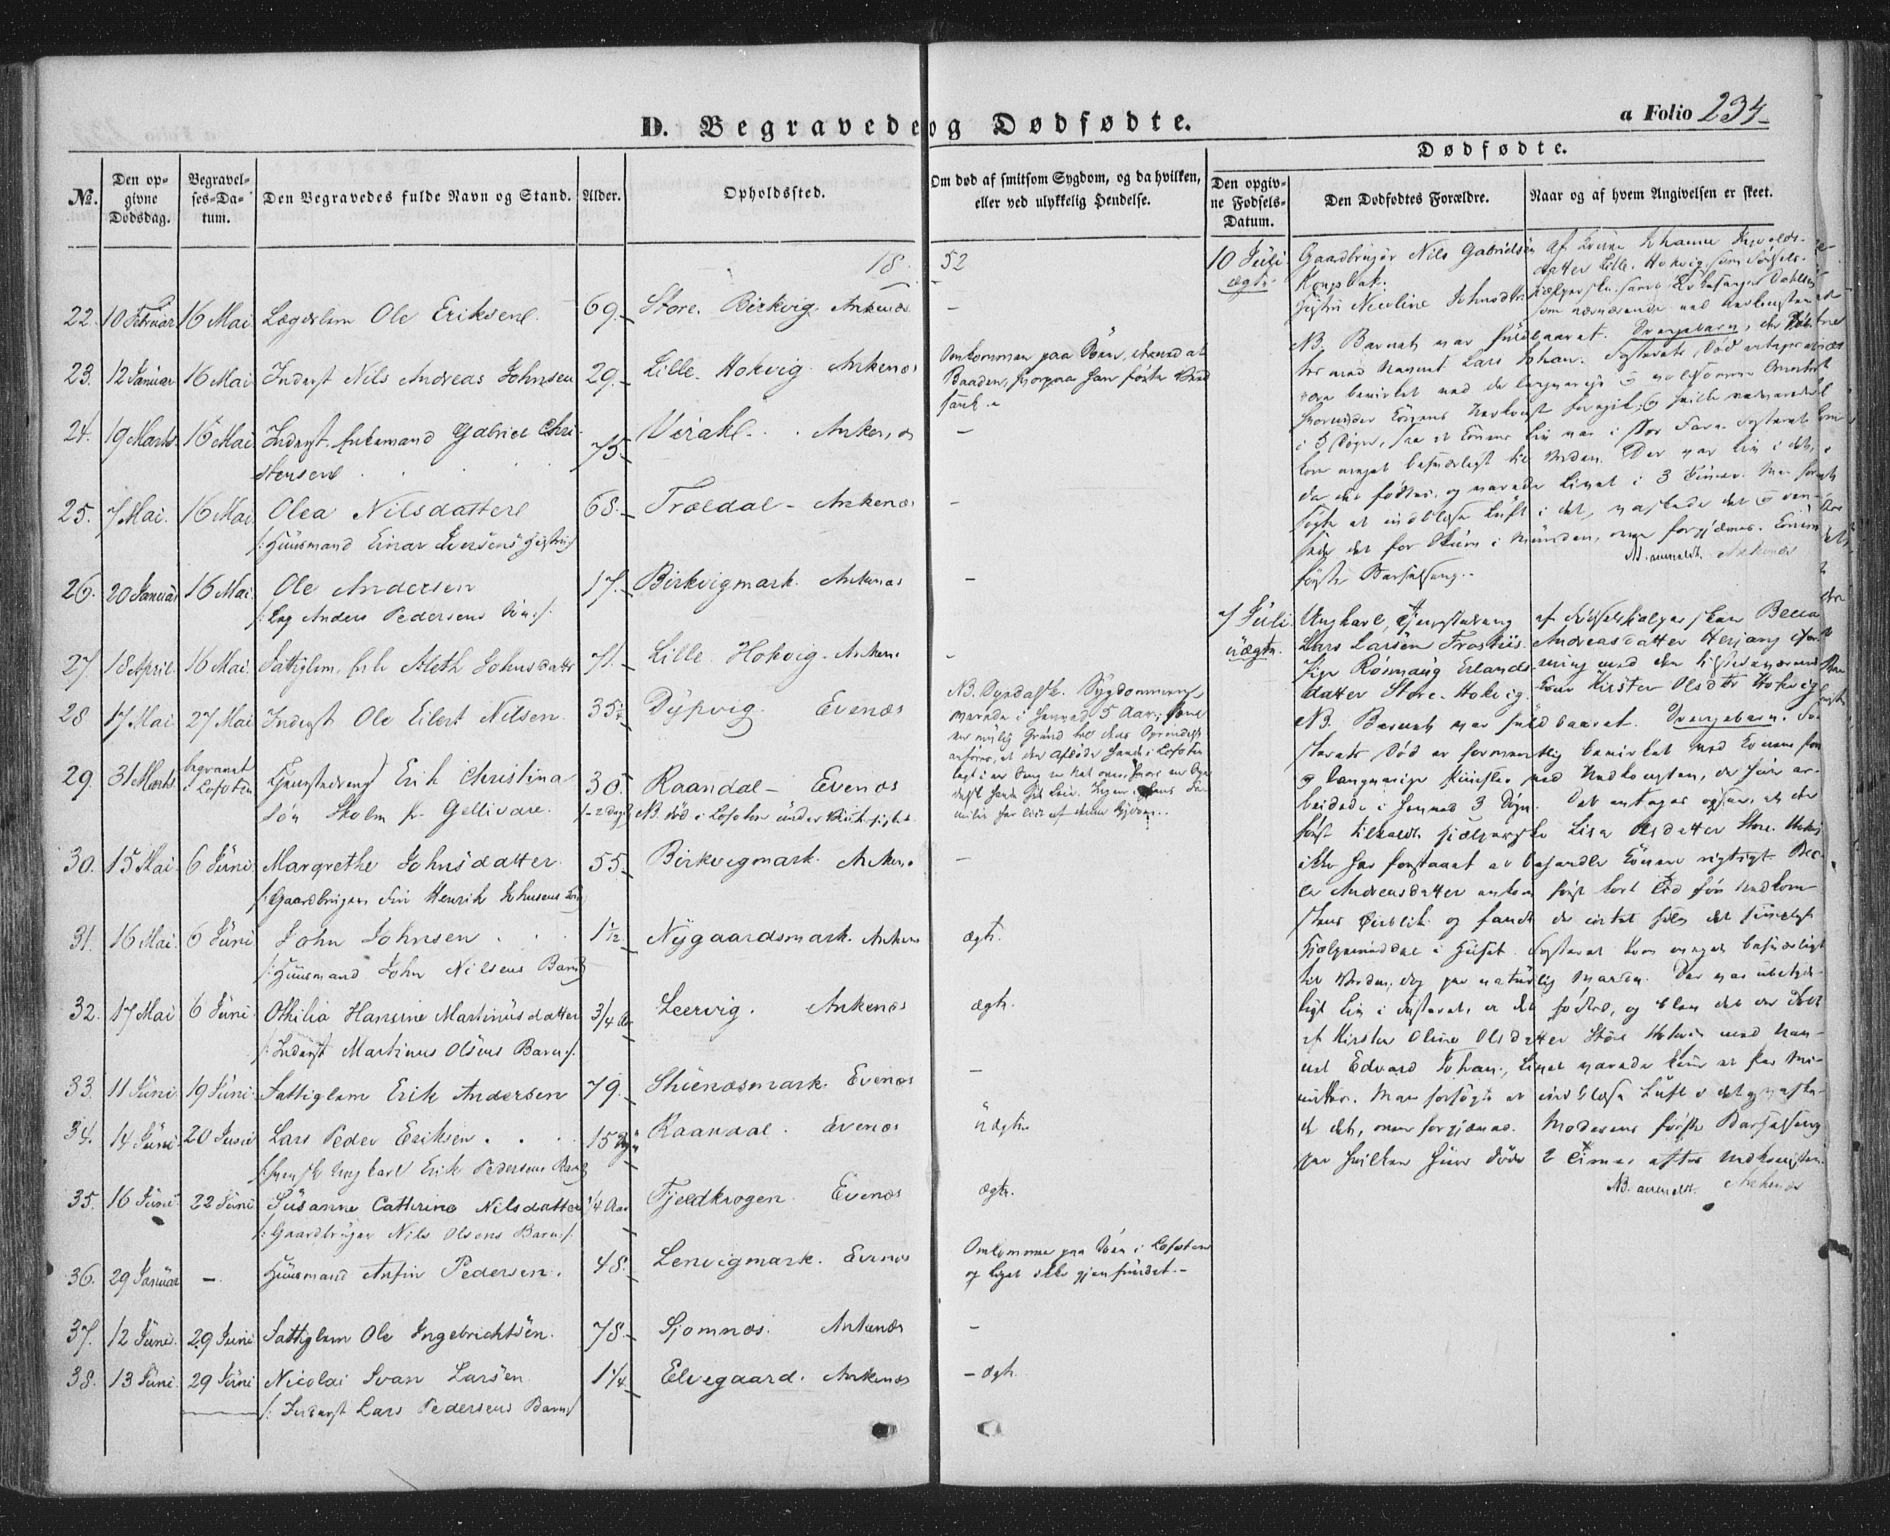 SAT, Ministerialprotokoller, klokkerbøker og fødselsregistre - Nordland, 863/L0895: Ministerialbok nr. 863A07, 1851-1860, s. 234